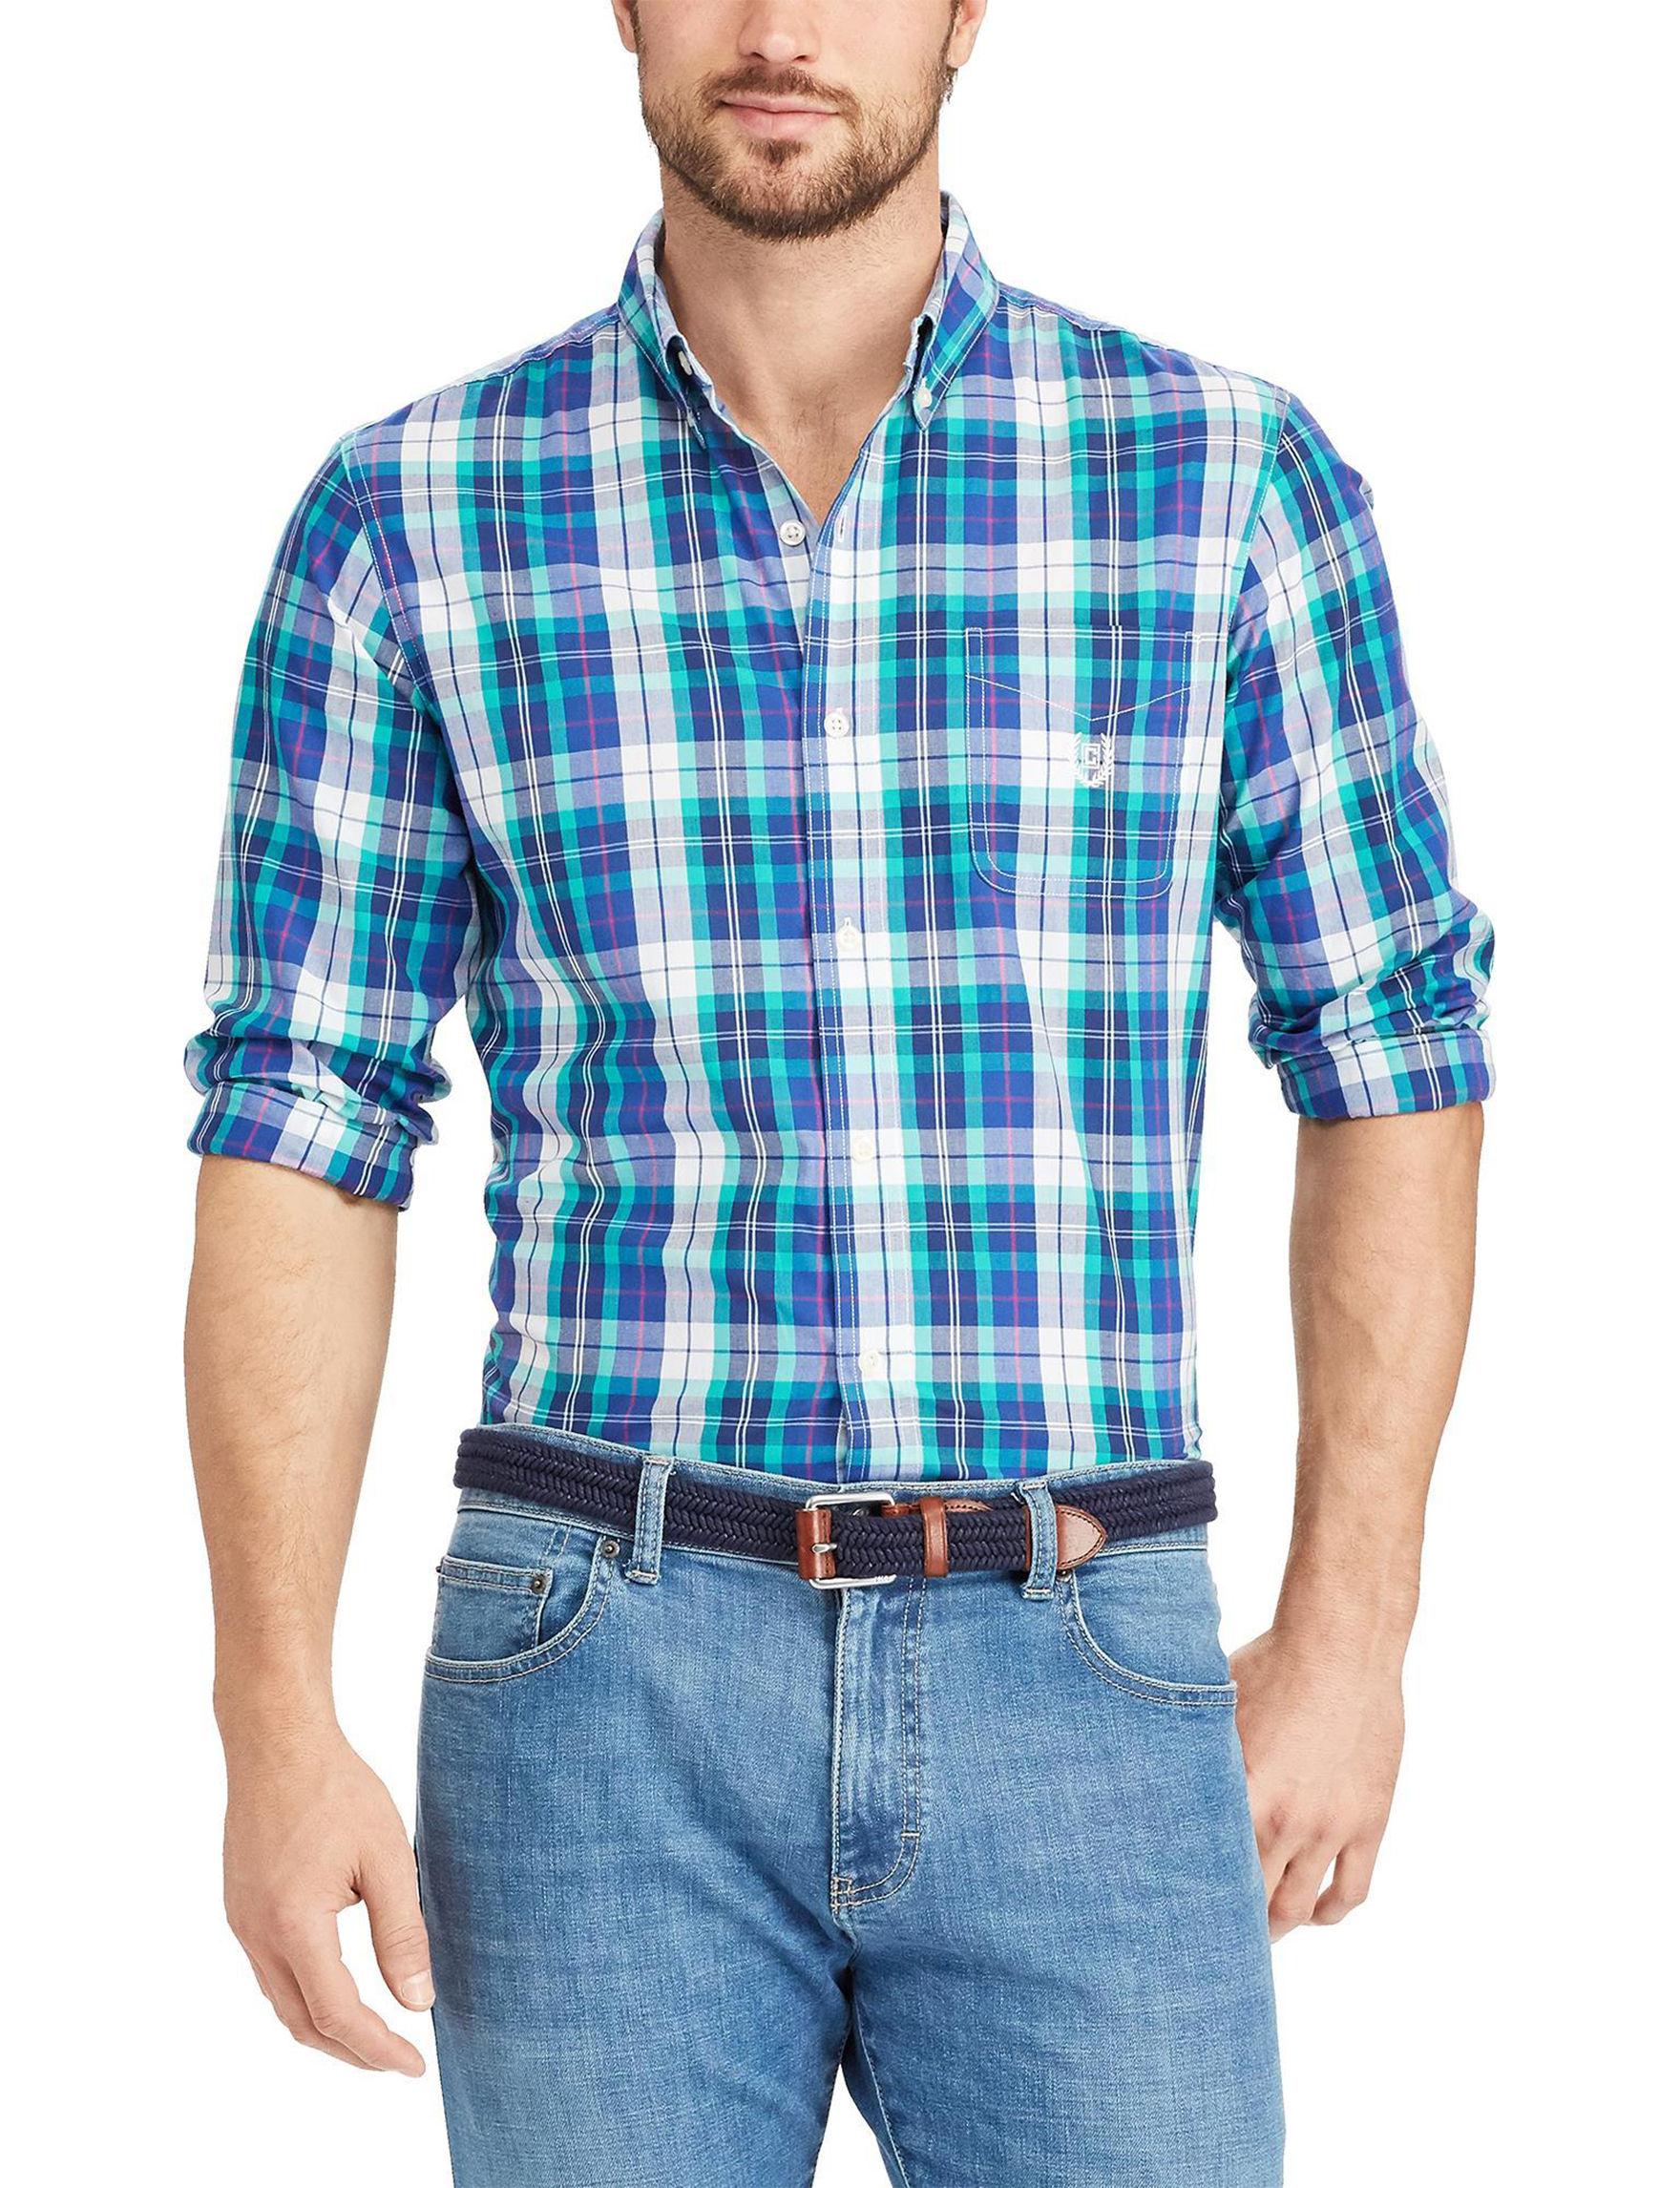 Chaps Blue / Green Casual Button Down Shirts